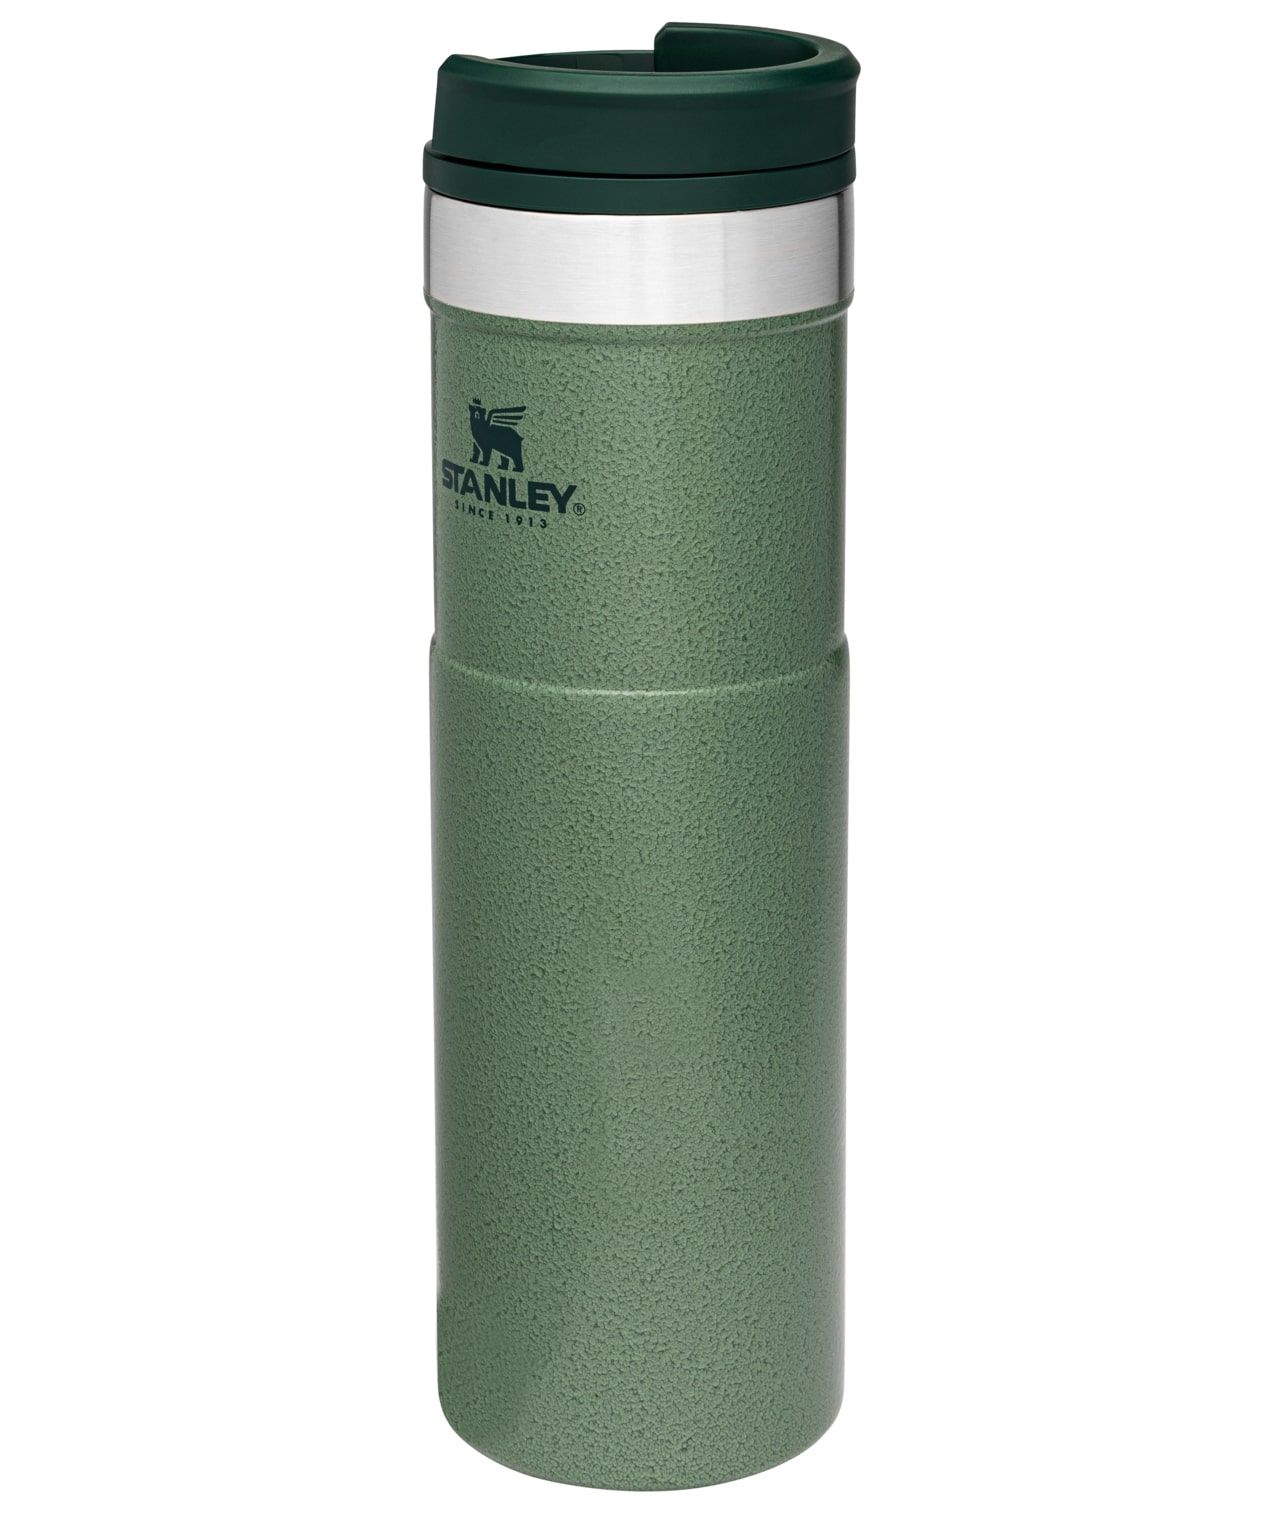 Stanley Classic The NeverLeak Travel Mug 20oz – 0.59L – HM Green